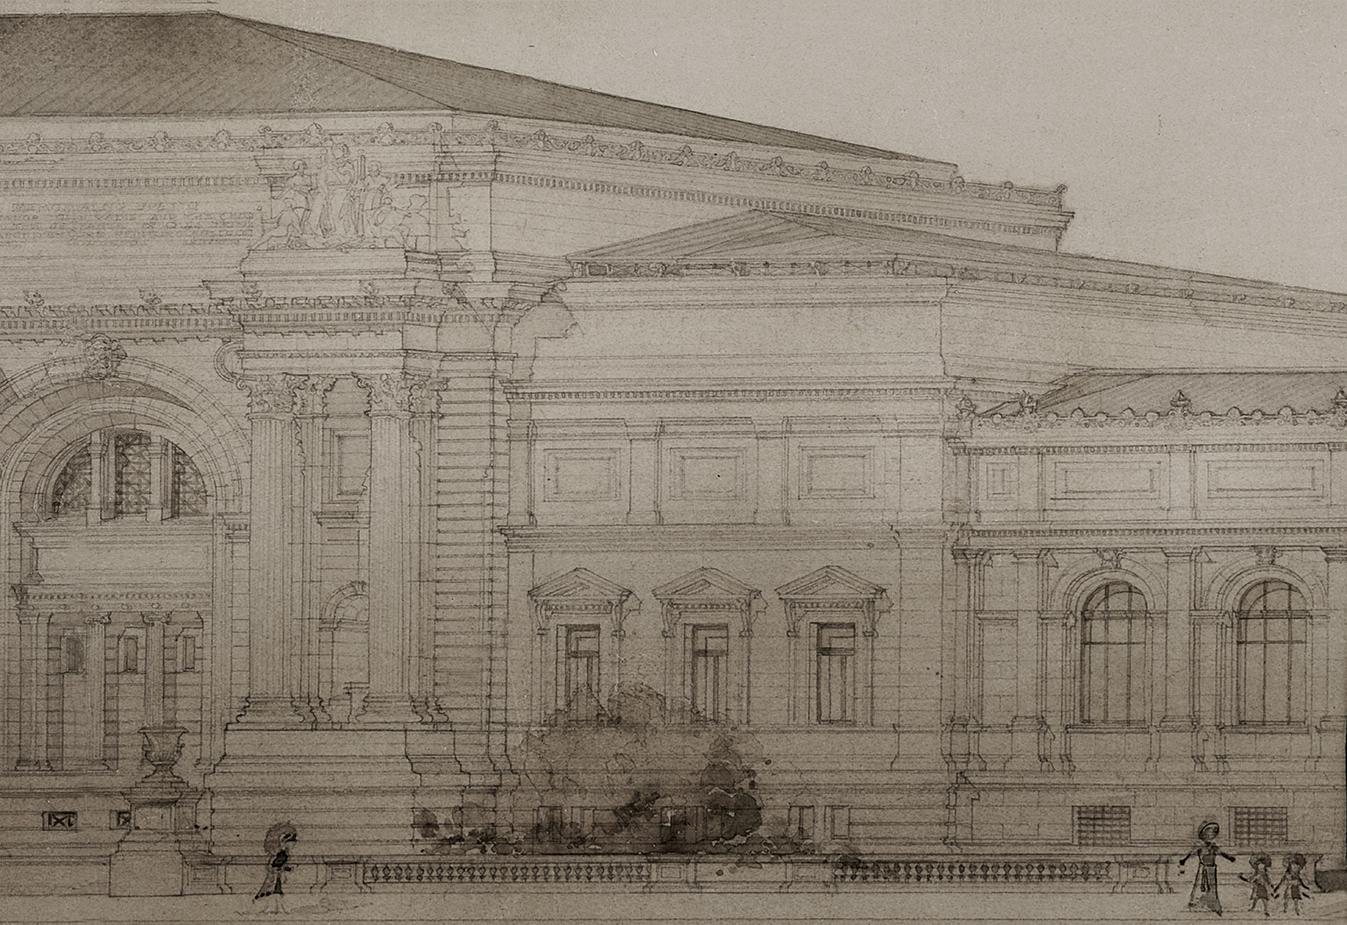 Metropolitan-Museum-of-Art_Exterior-Drawing_Stephen-Alesch_full.jpg